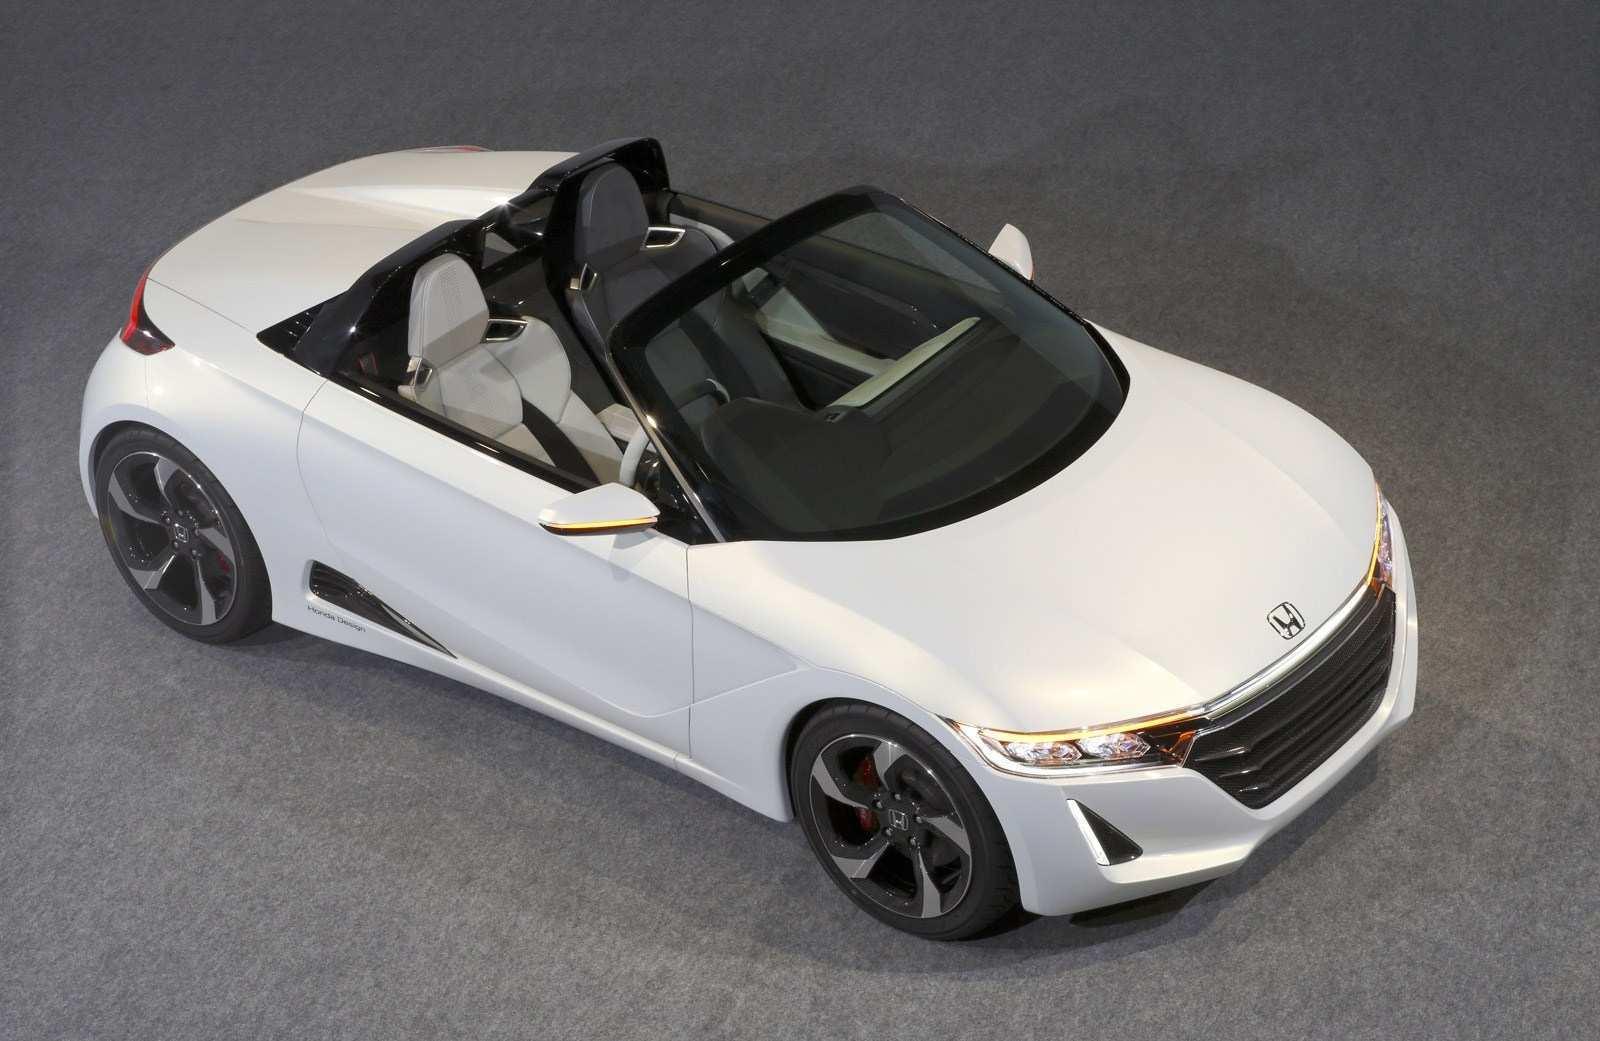 70 Great 2020 Honda S660 Exterior and Interior for 2020 Honda S660